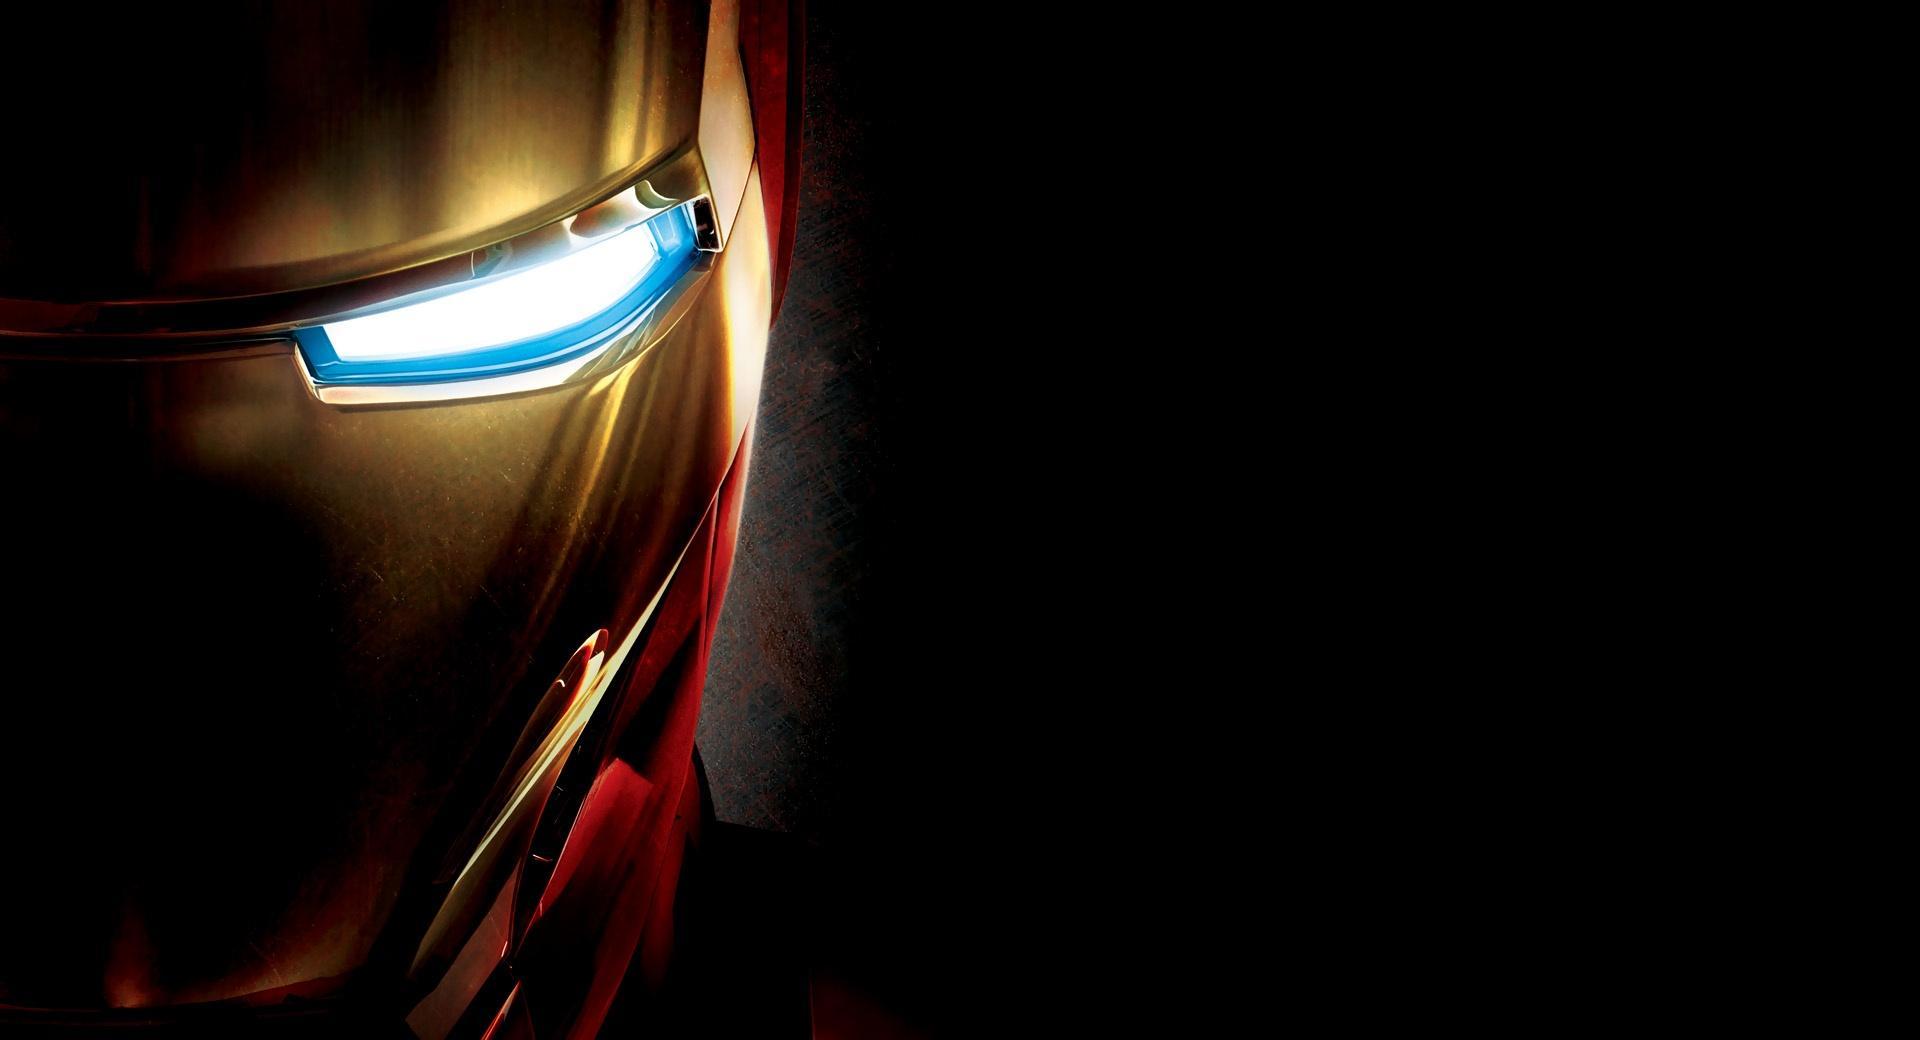 Iron Man Eye wallpapers HD quality